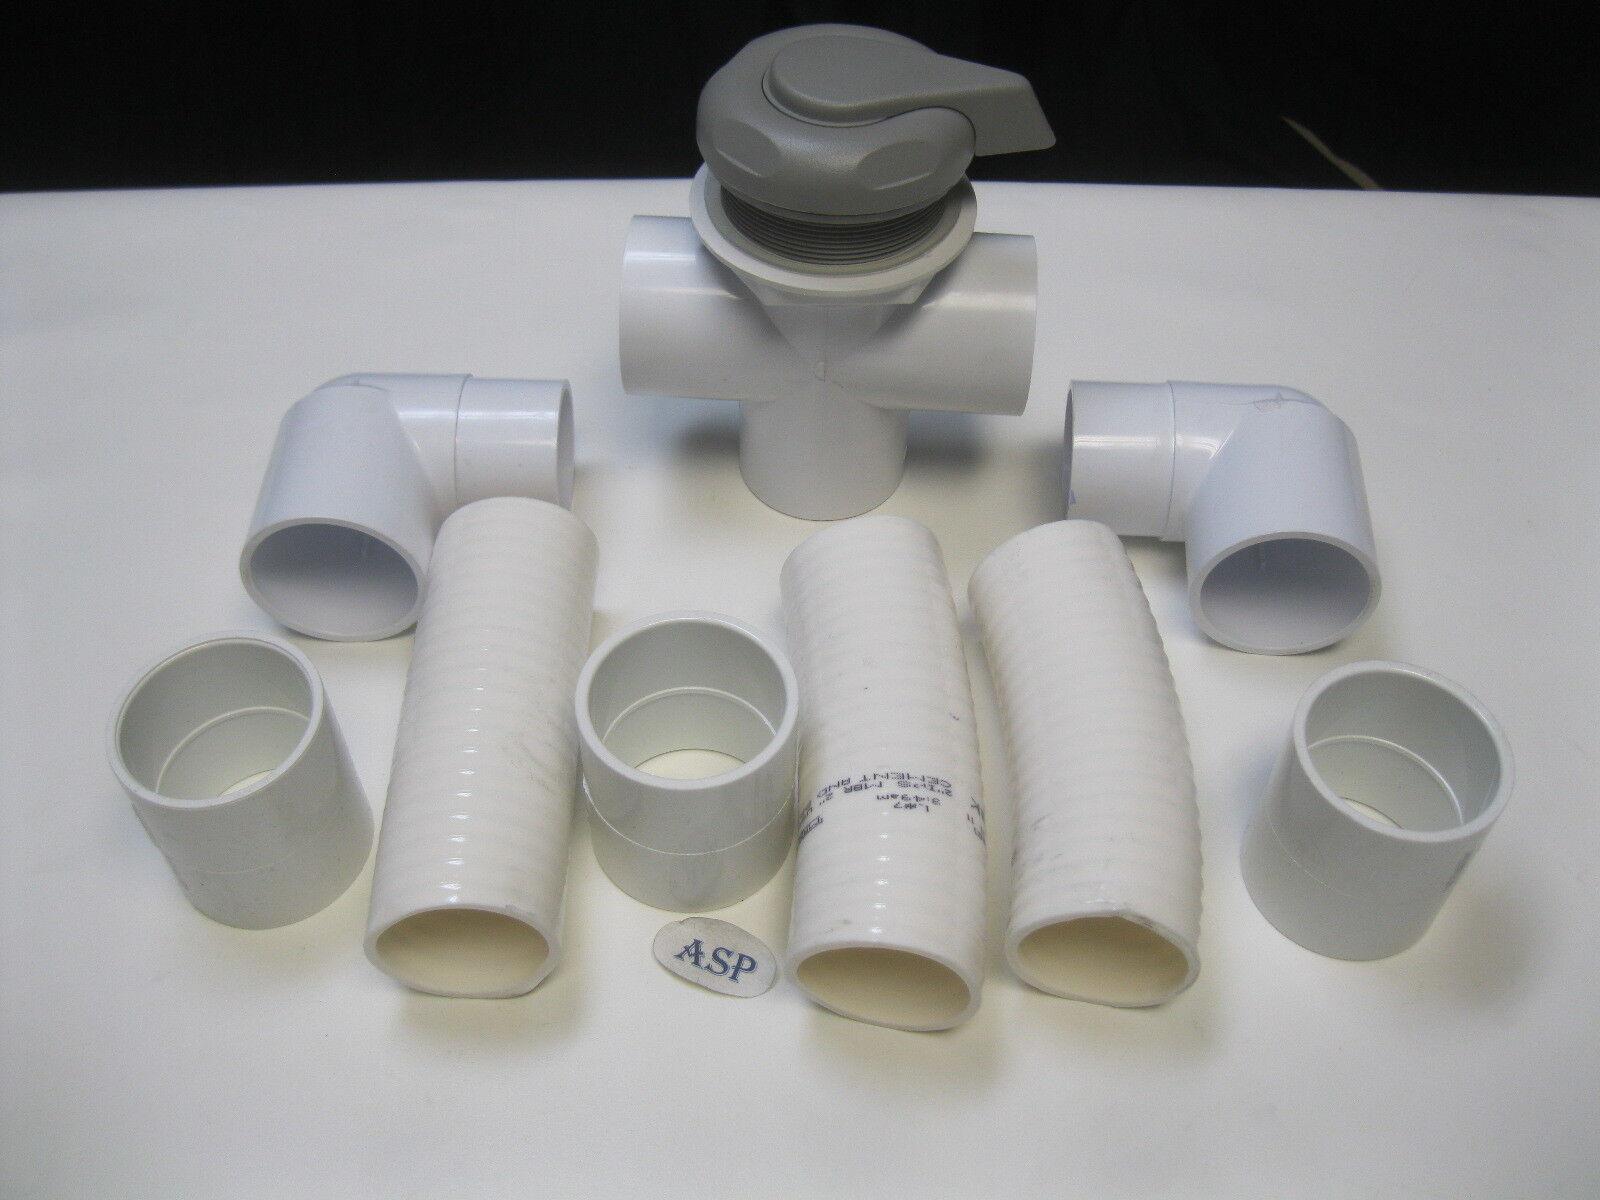 Spa Hot Tub Diverter Handle Knob 4 Long 2 Wide Gray